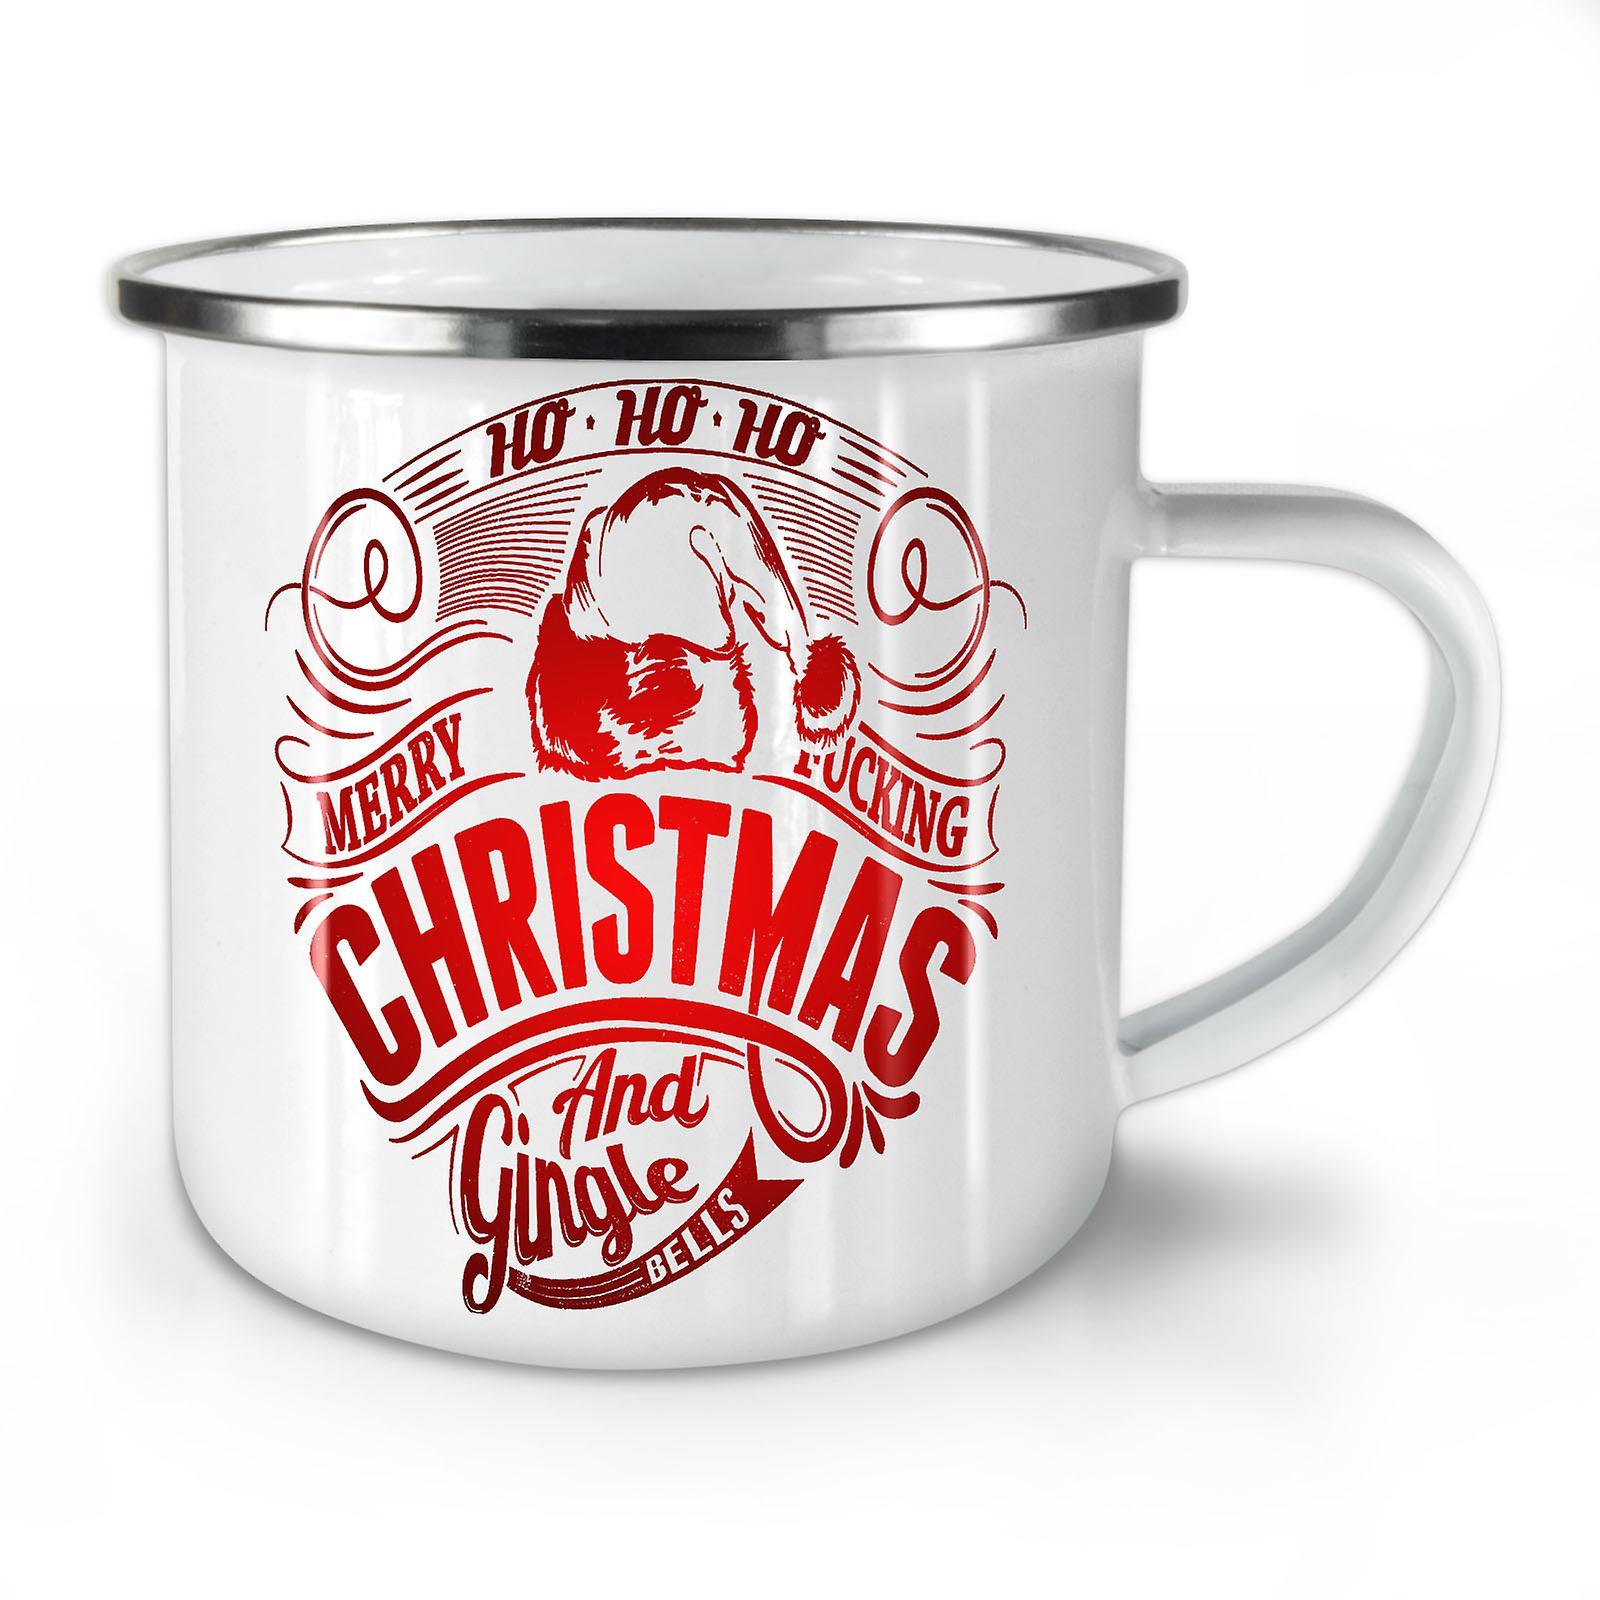 Émail Cloches Whitetea OzWellcoda Noël Gingle Café De Mug10 Nouvelle PTwXZiklOu